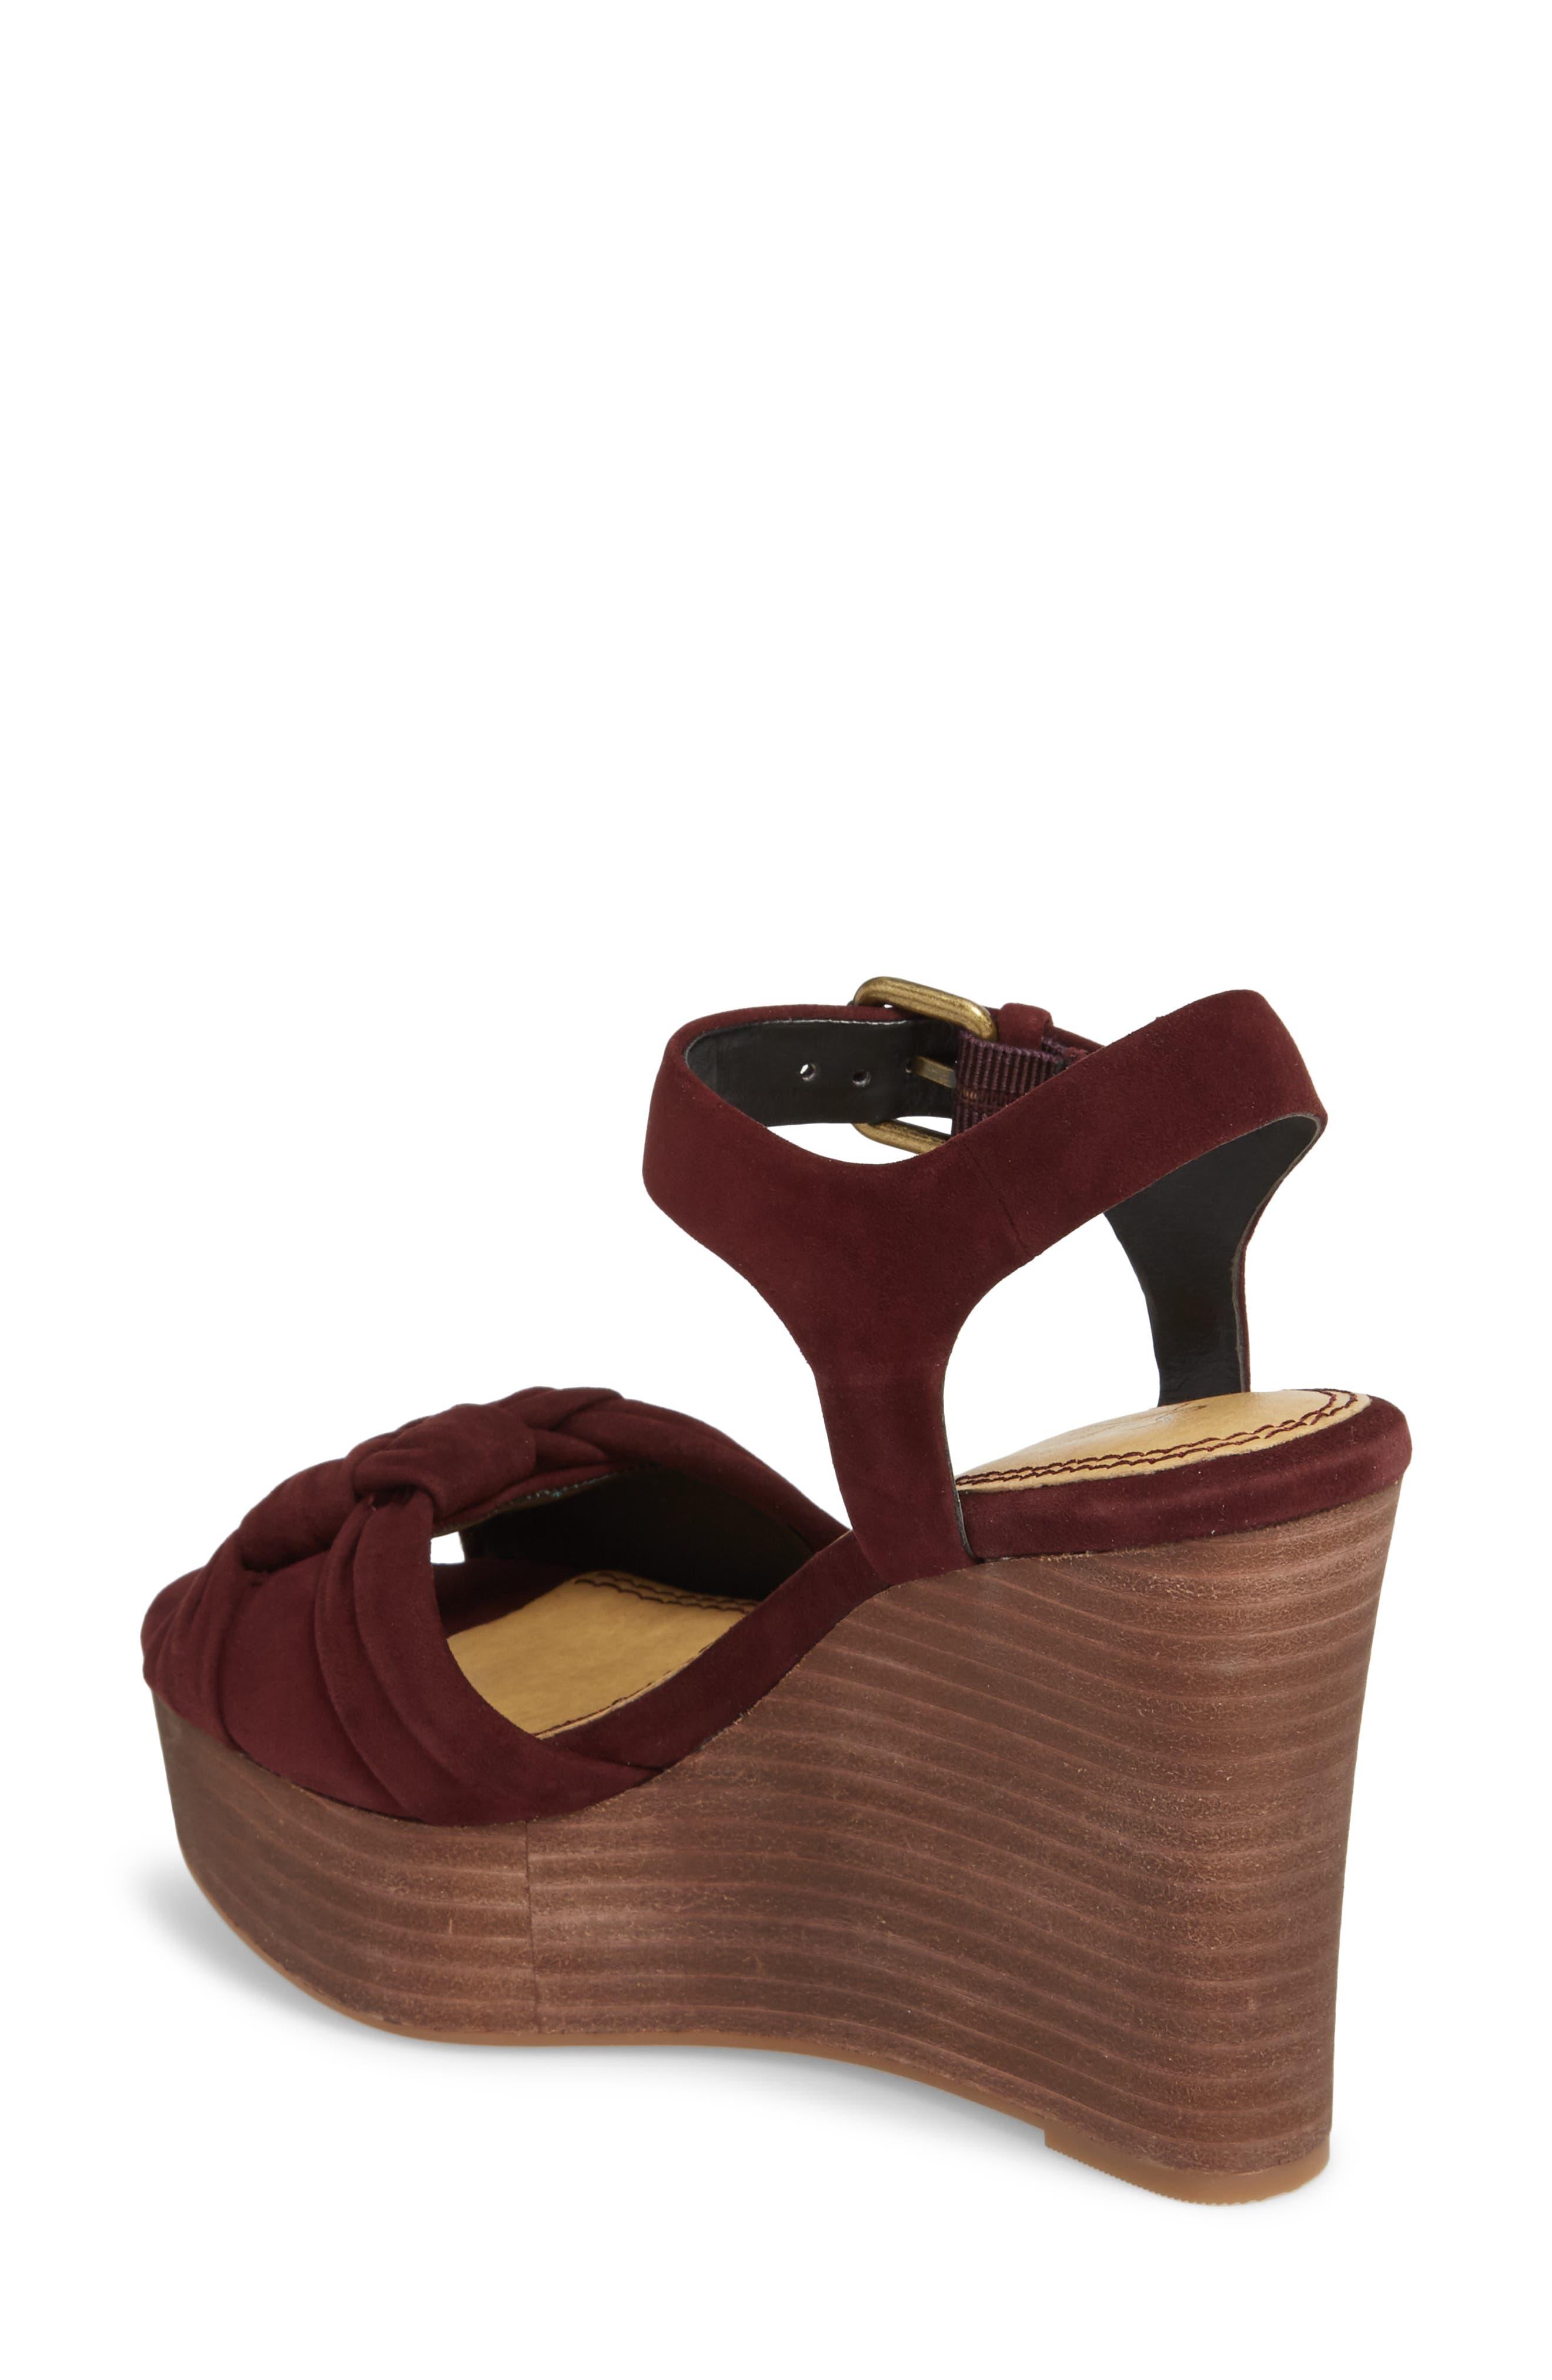 Nada Platform Wedge Sandal,                             Alternate thumbnail 2, color,                             Deep Plum Suede